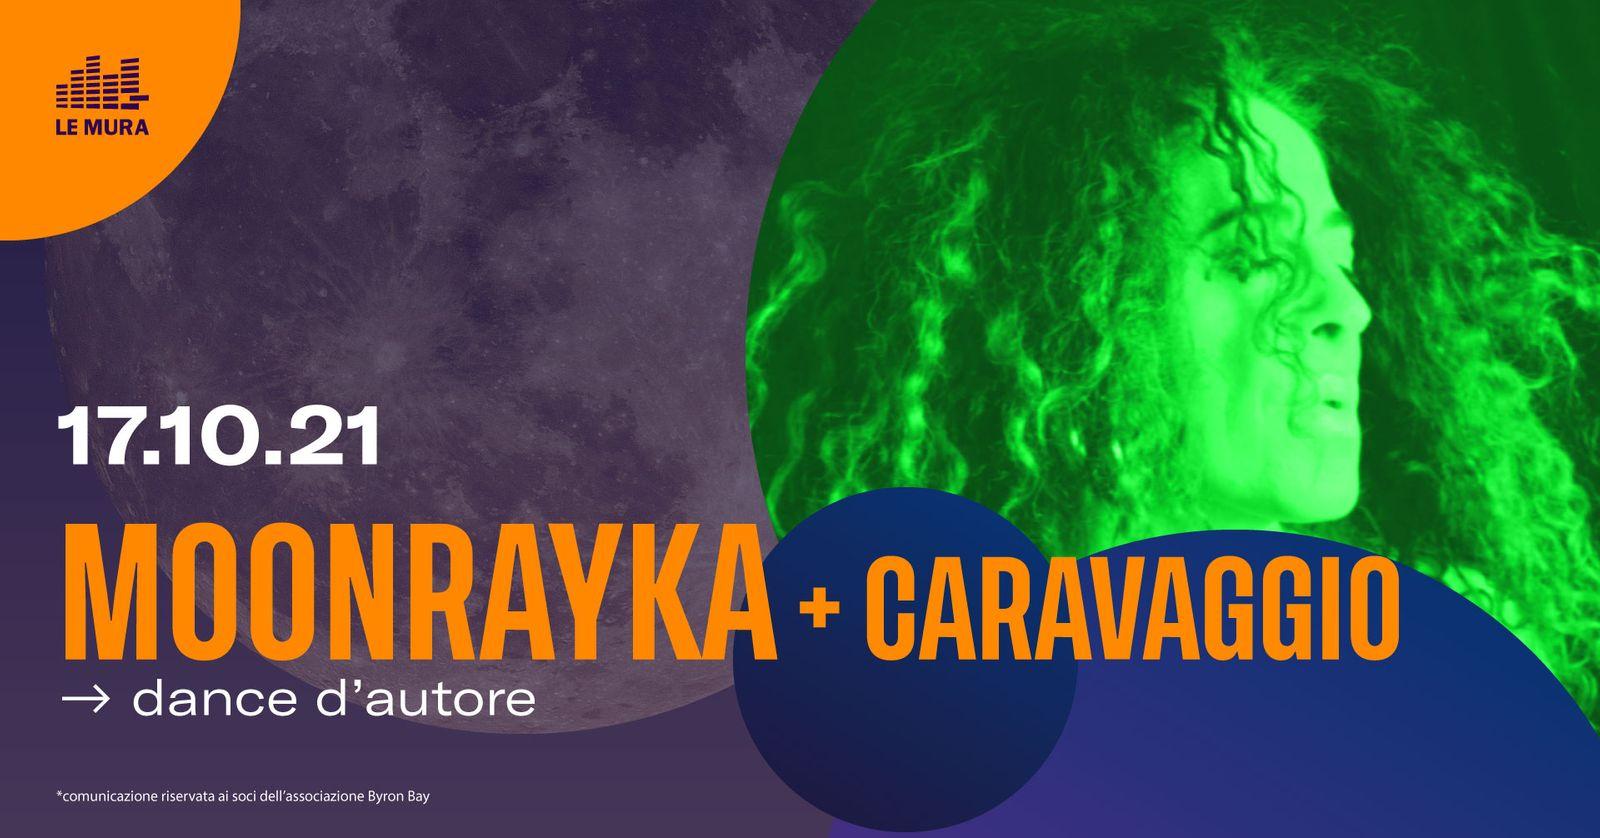 Moonrayka - Le Mura